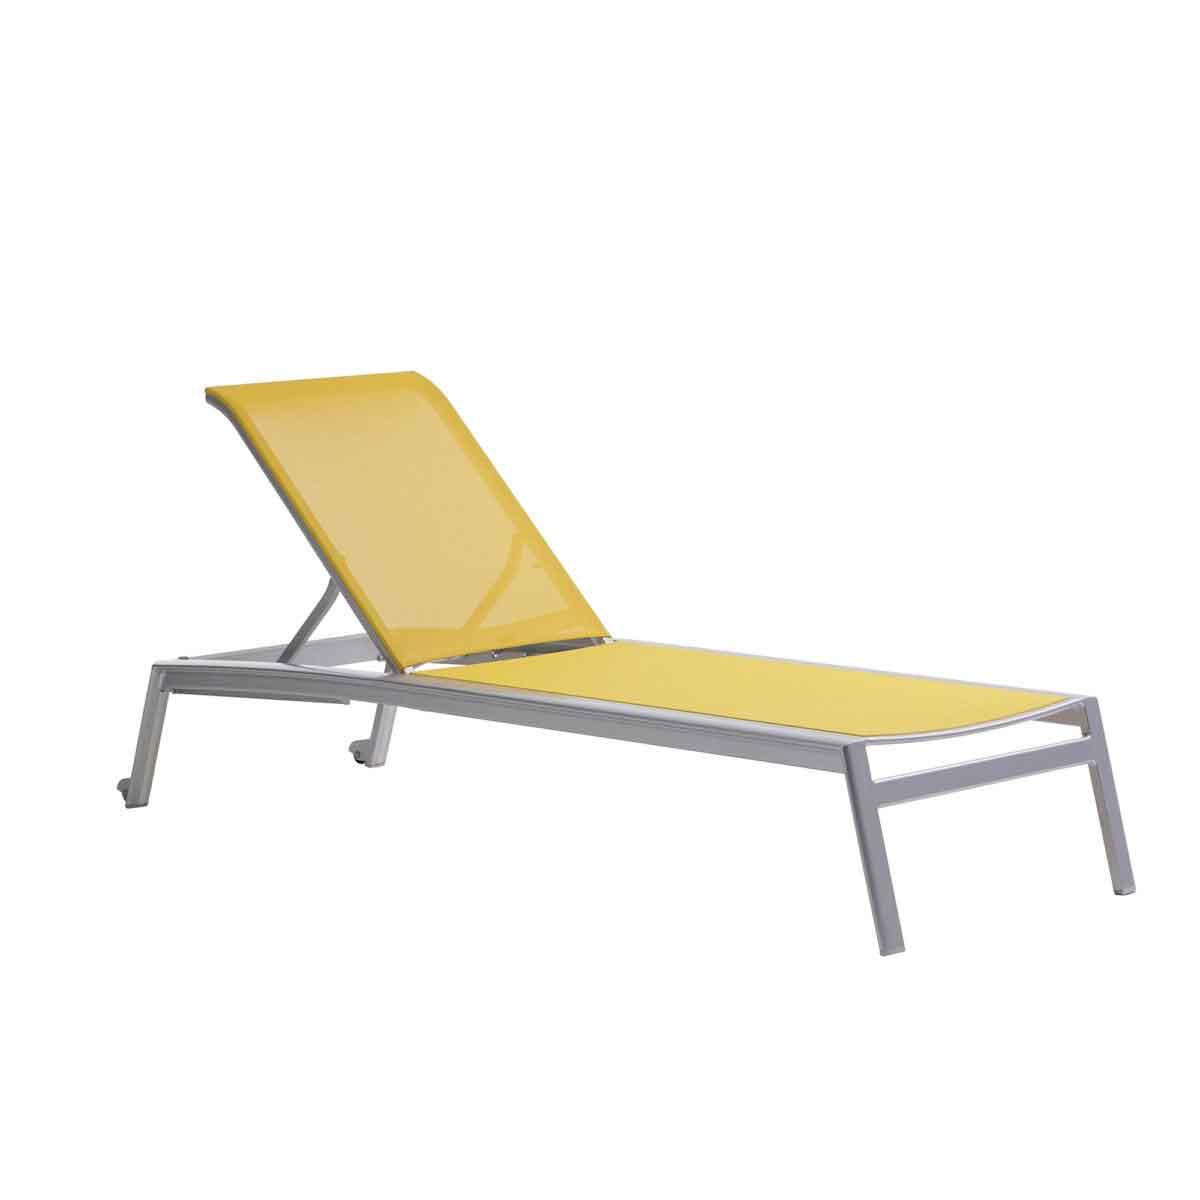 Lyon Sling Armless Chaise - Batyline Solar